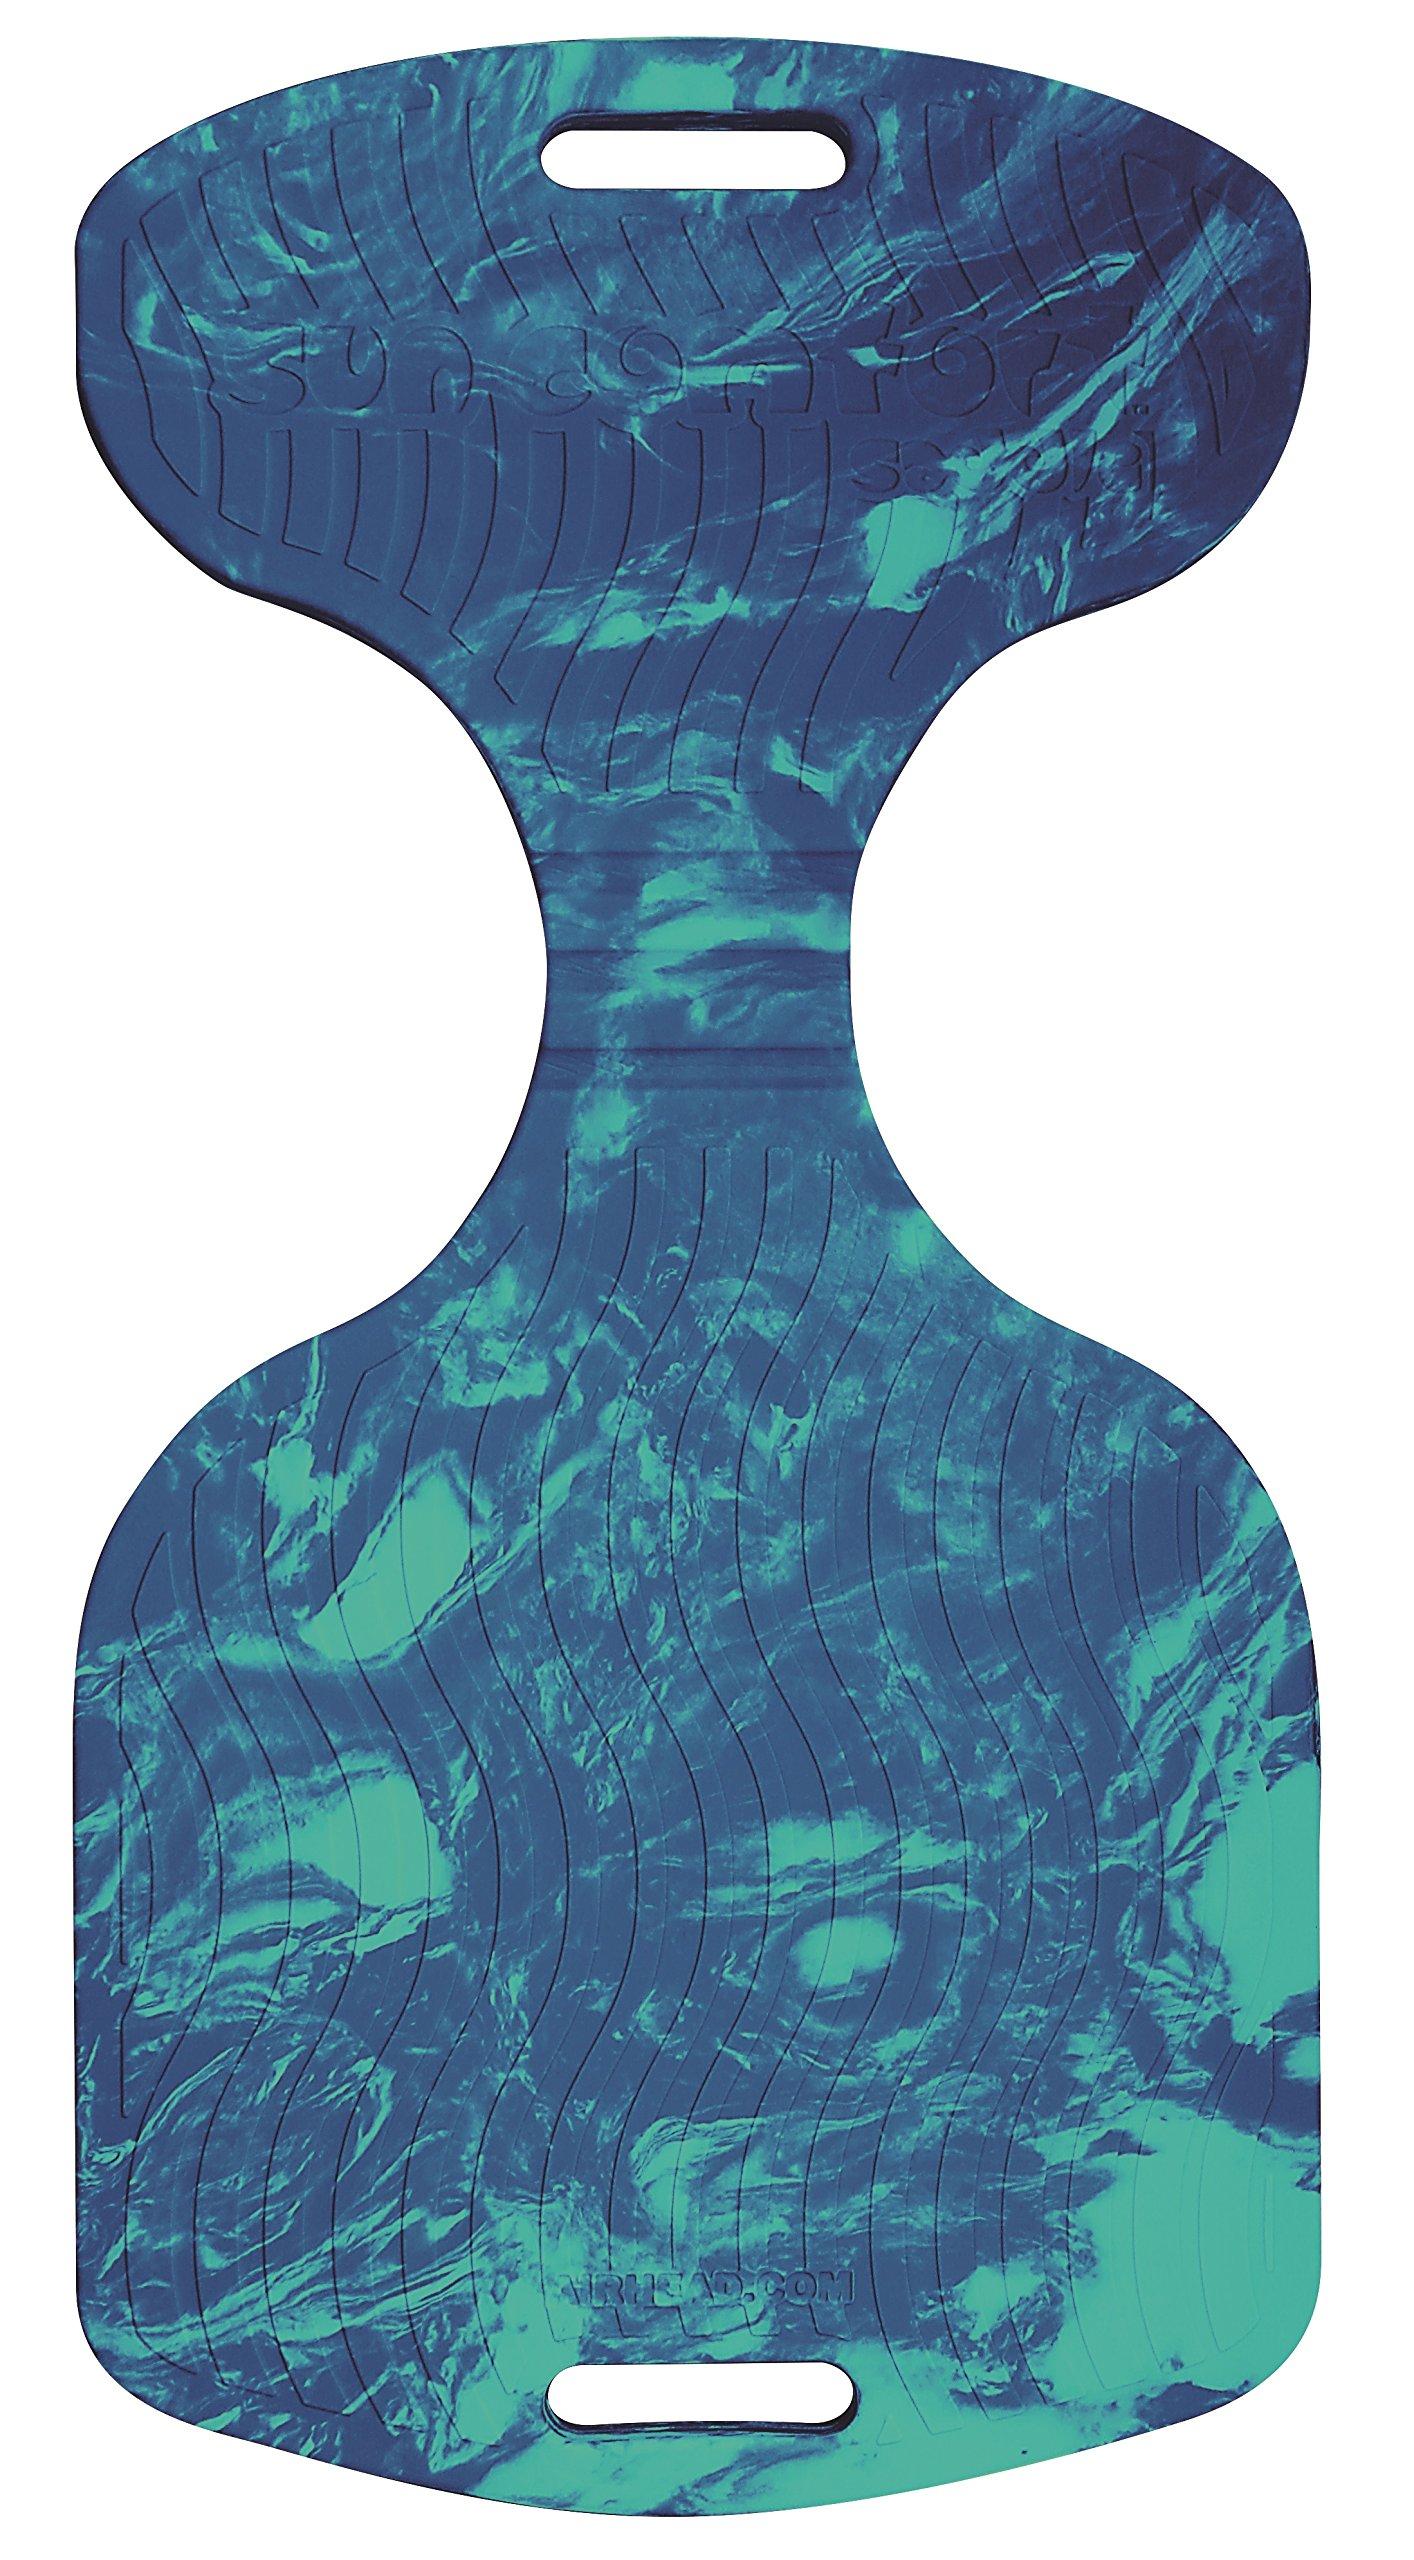 Airhead Sun Comfort Pool Saddle, Sapphire, 32'' x 16'' x 1.25'' by Airhead (Image #1)